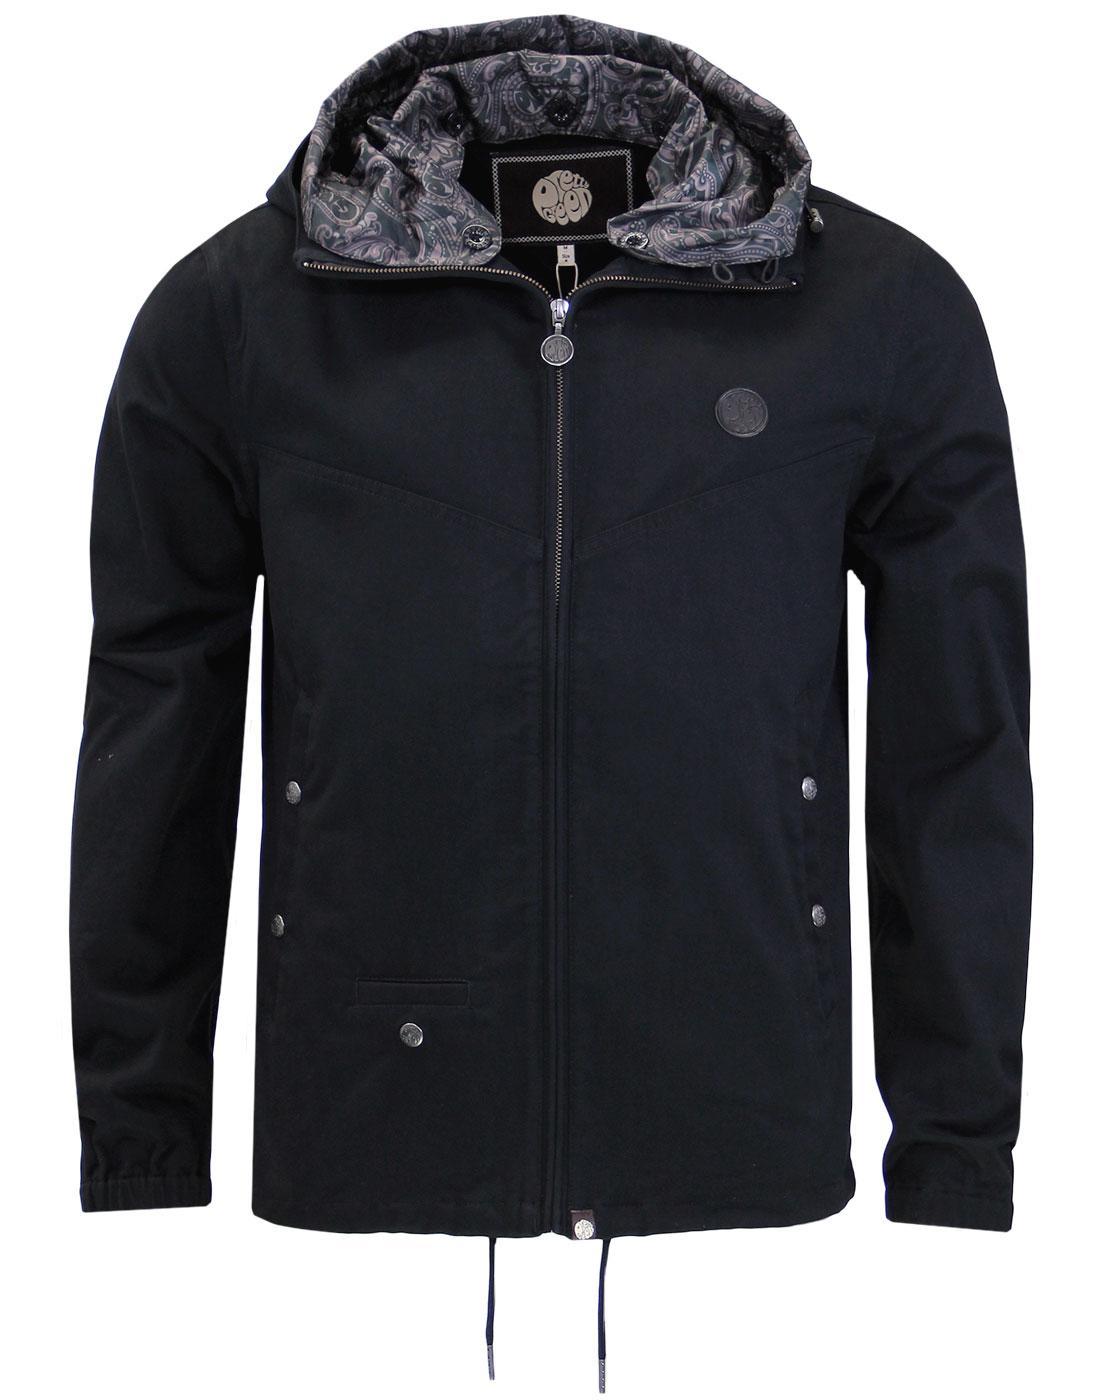 Beckford PRETTY GREEN Retro Hooded Jacket BLACK